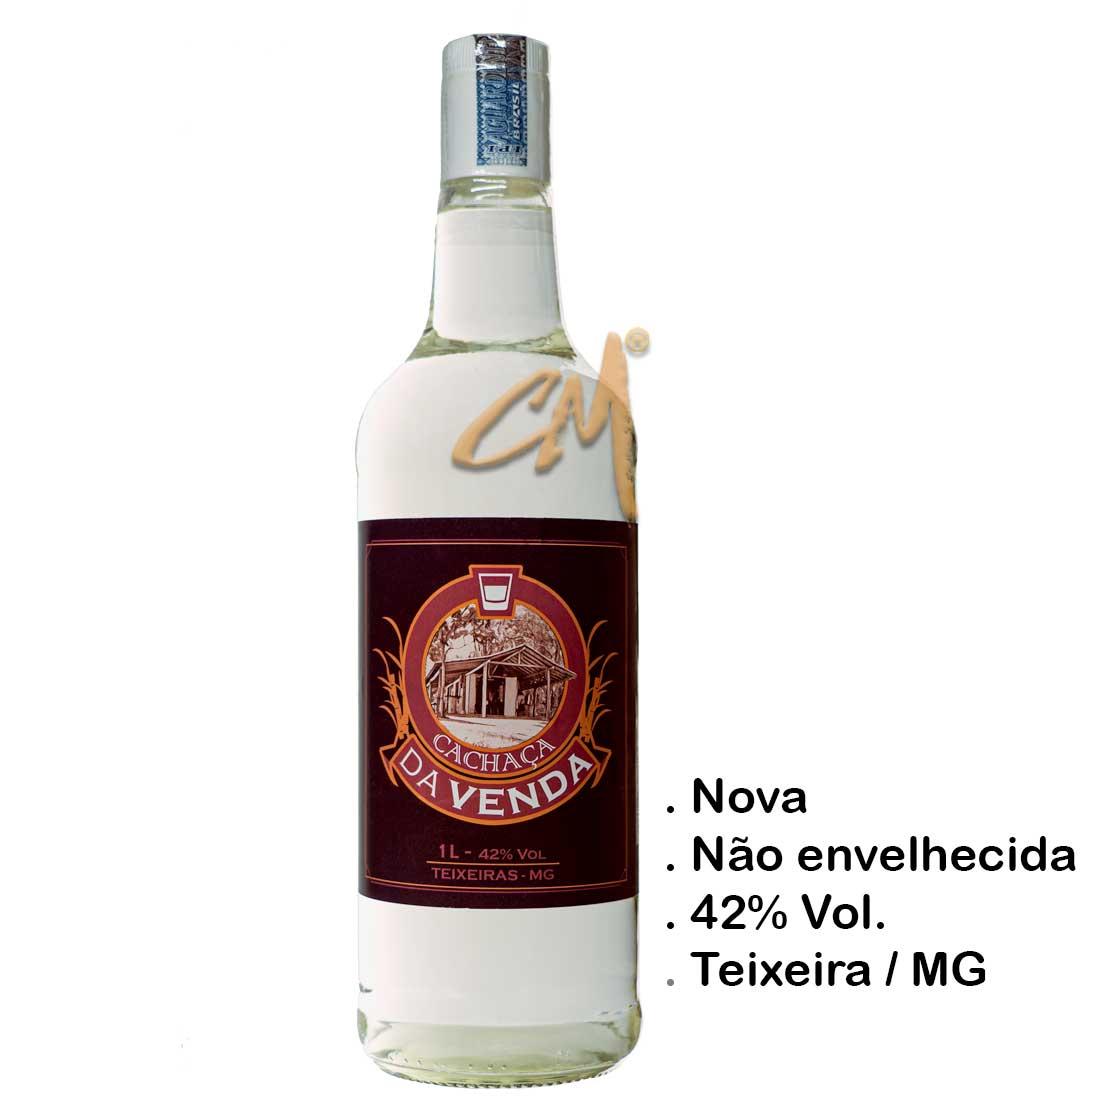 Cachaça Da Venda Prata 1000 ml (Teixeiras - MG)